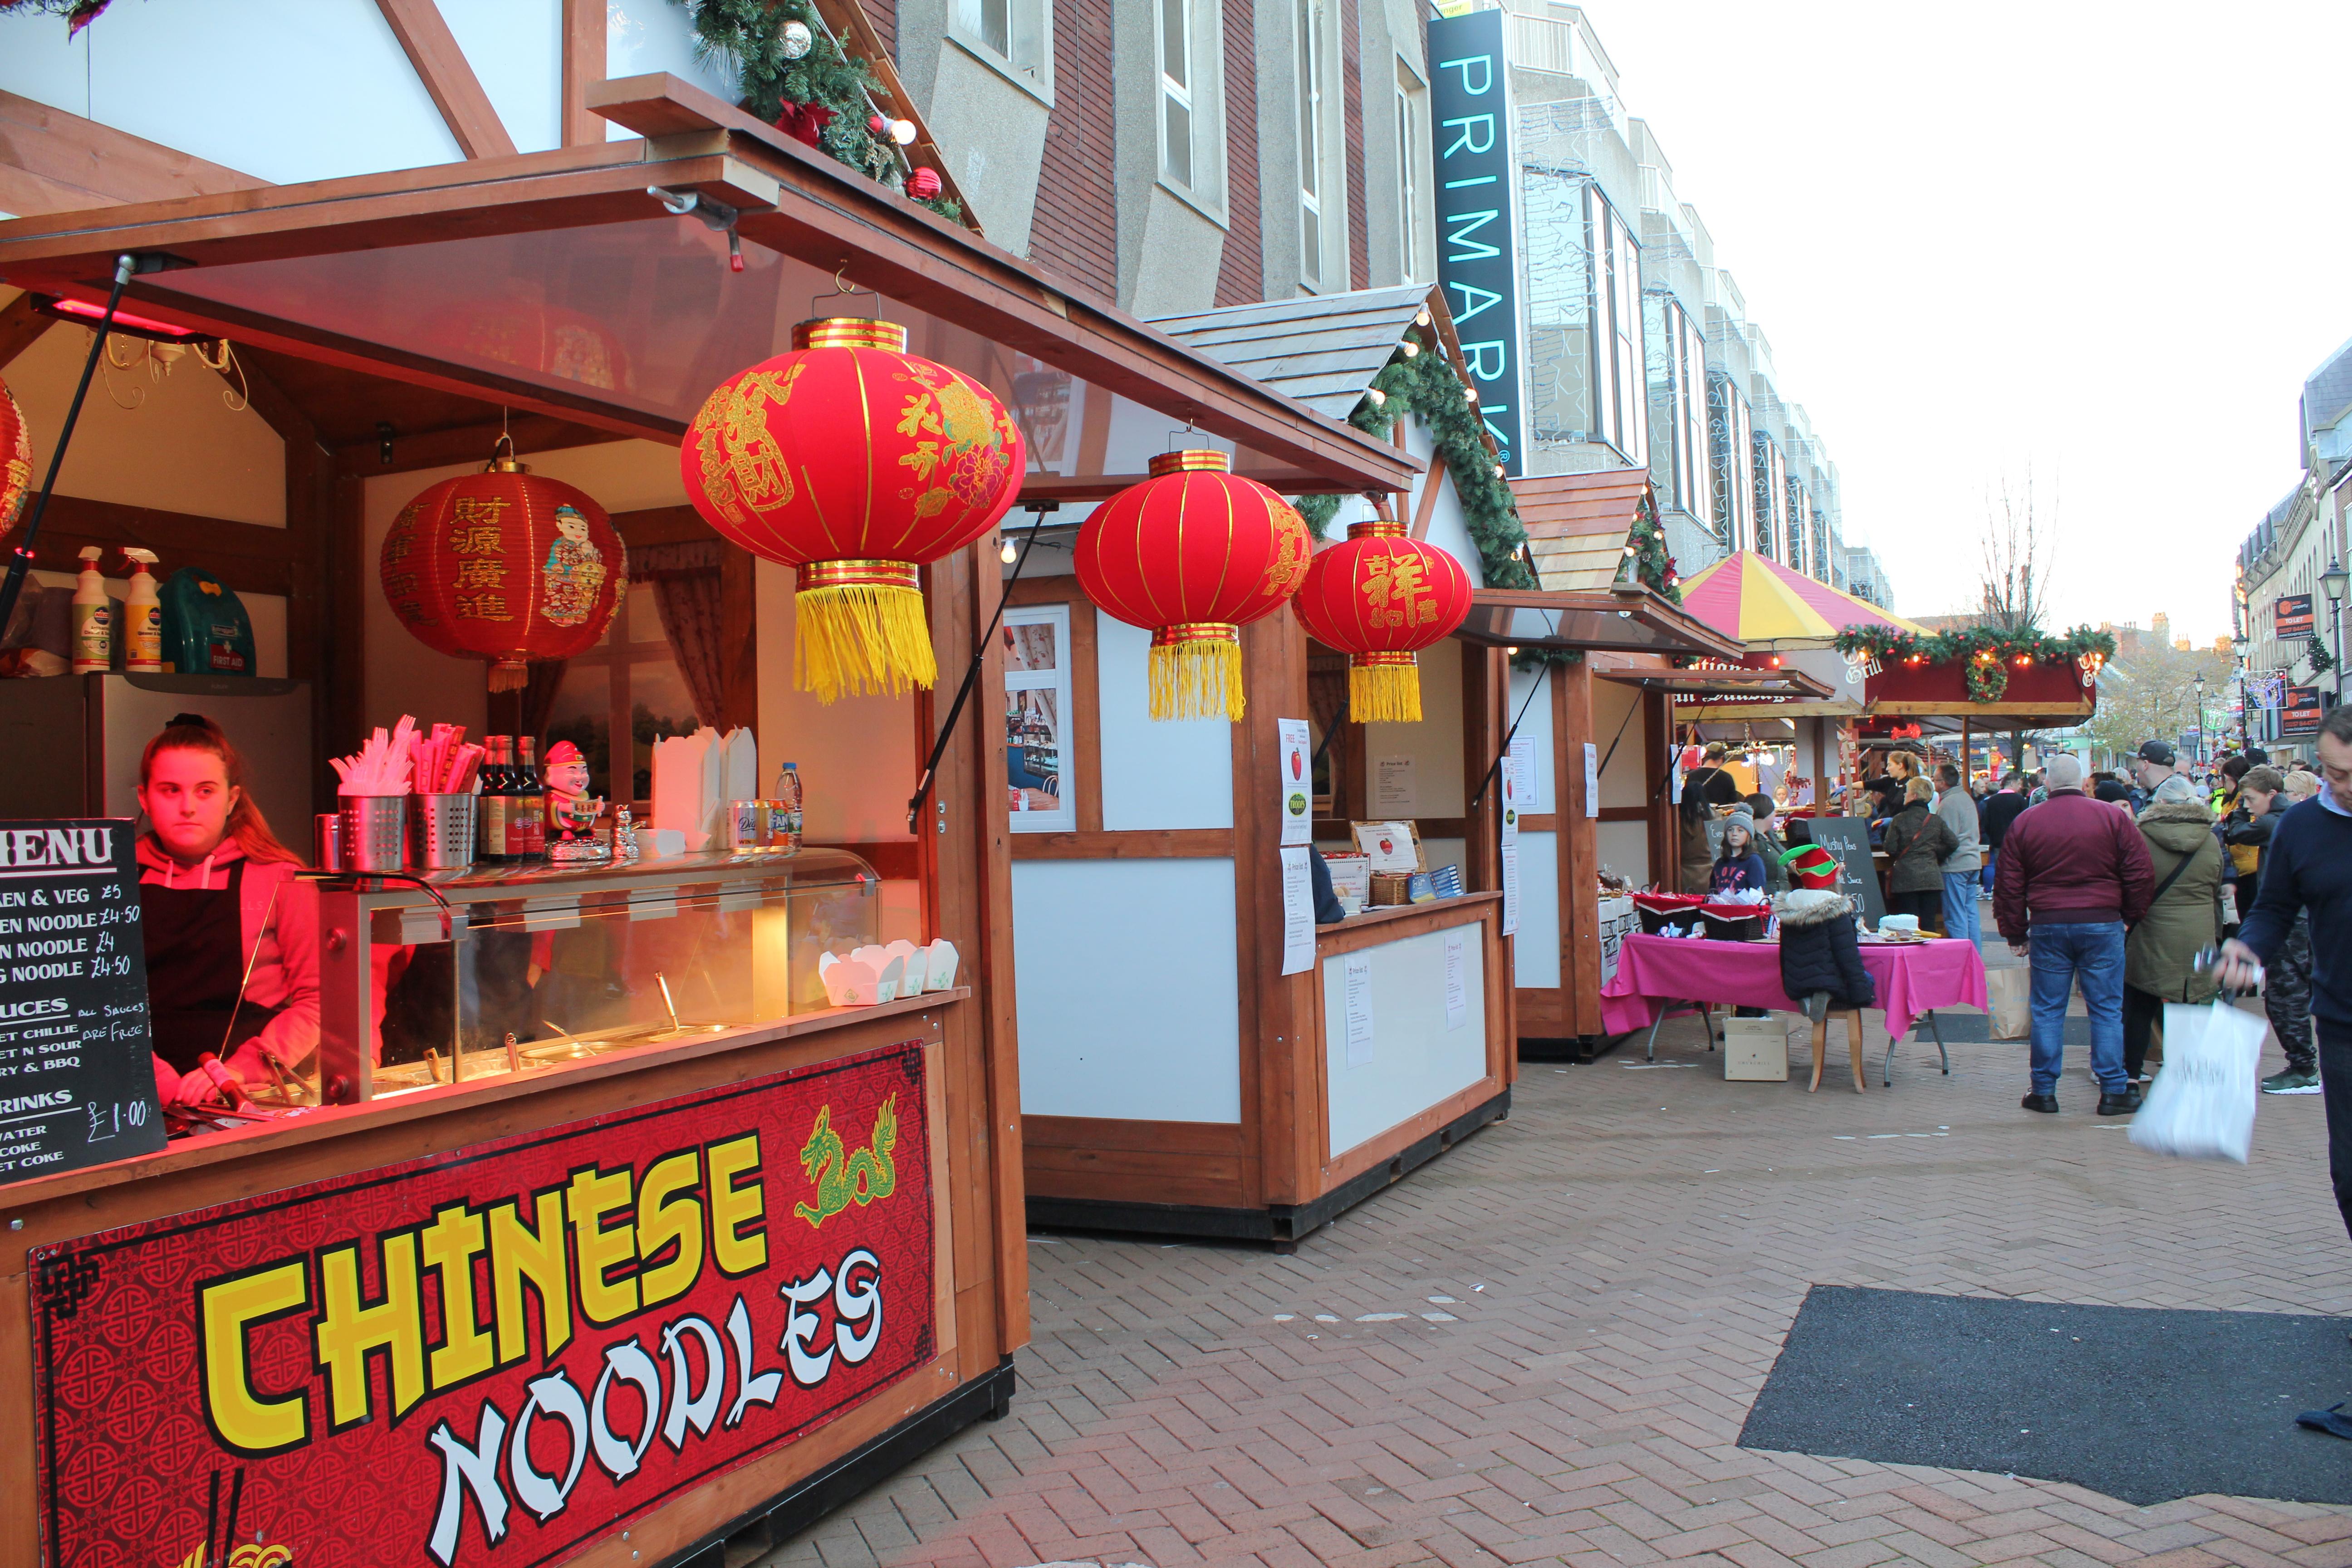 Christmas market on West Gate